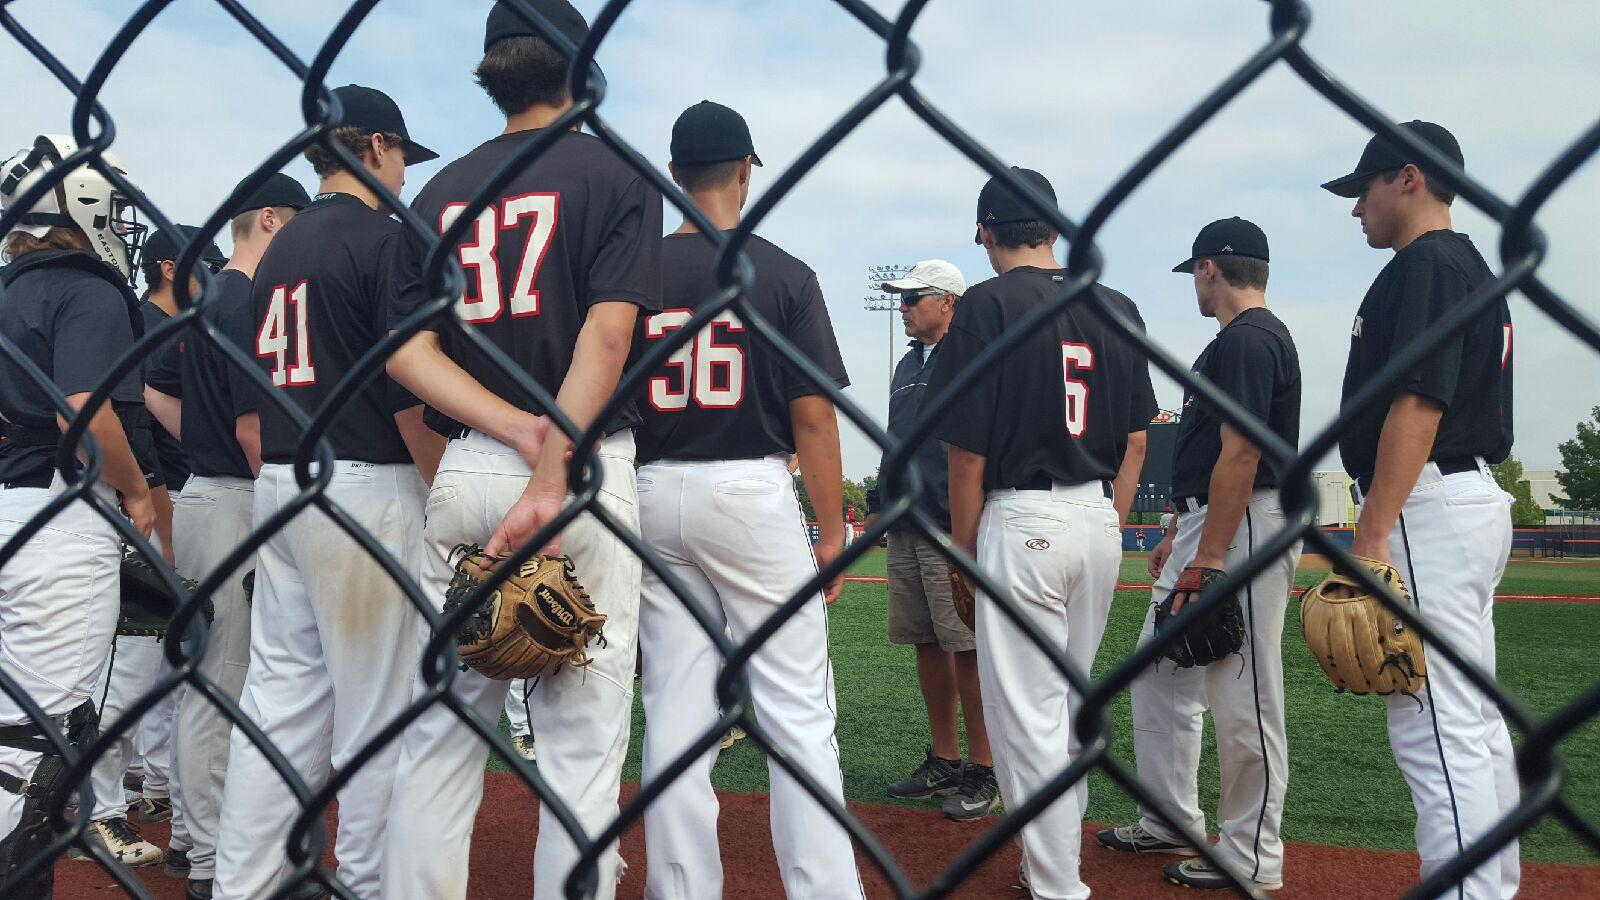 Barn Fall Team Plays at University of Illinois